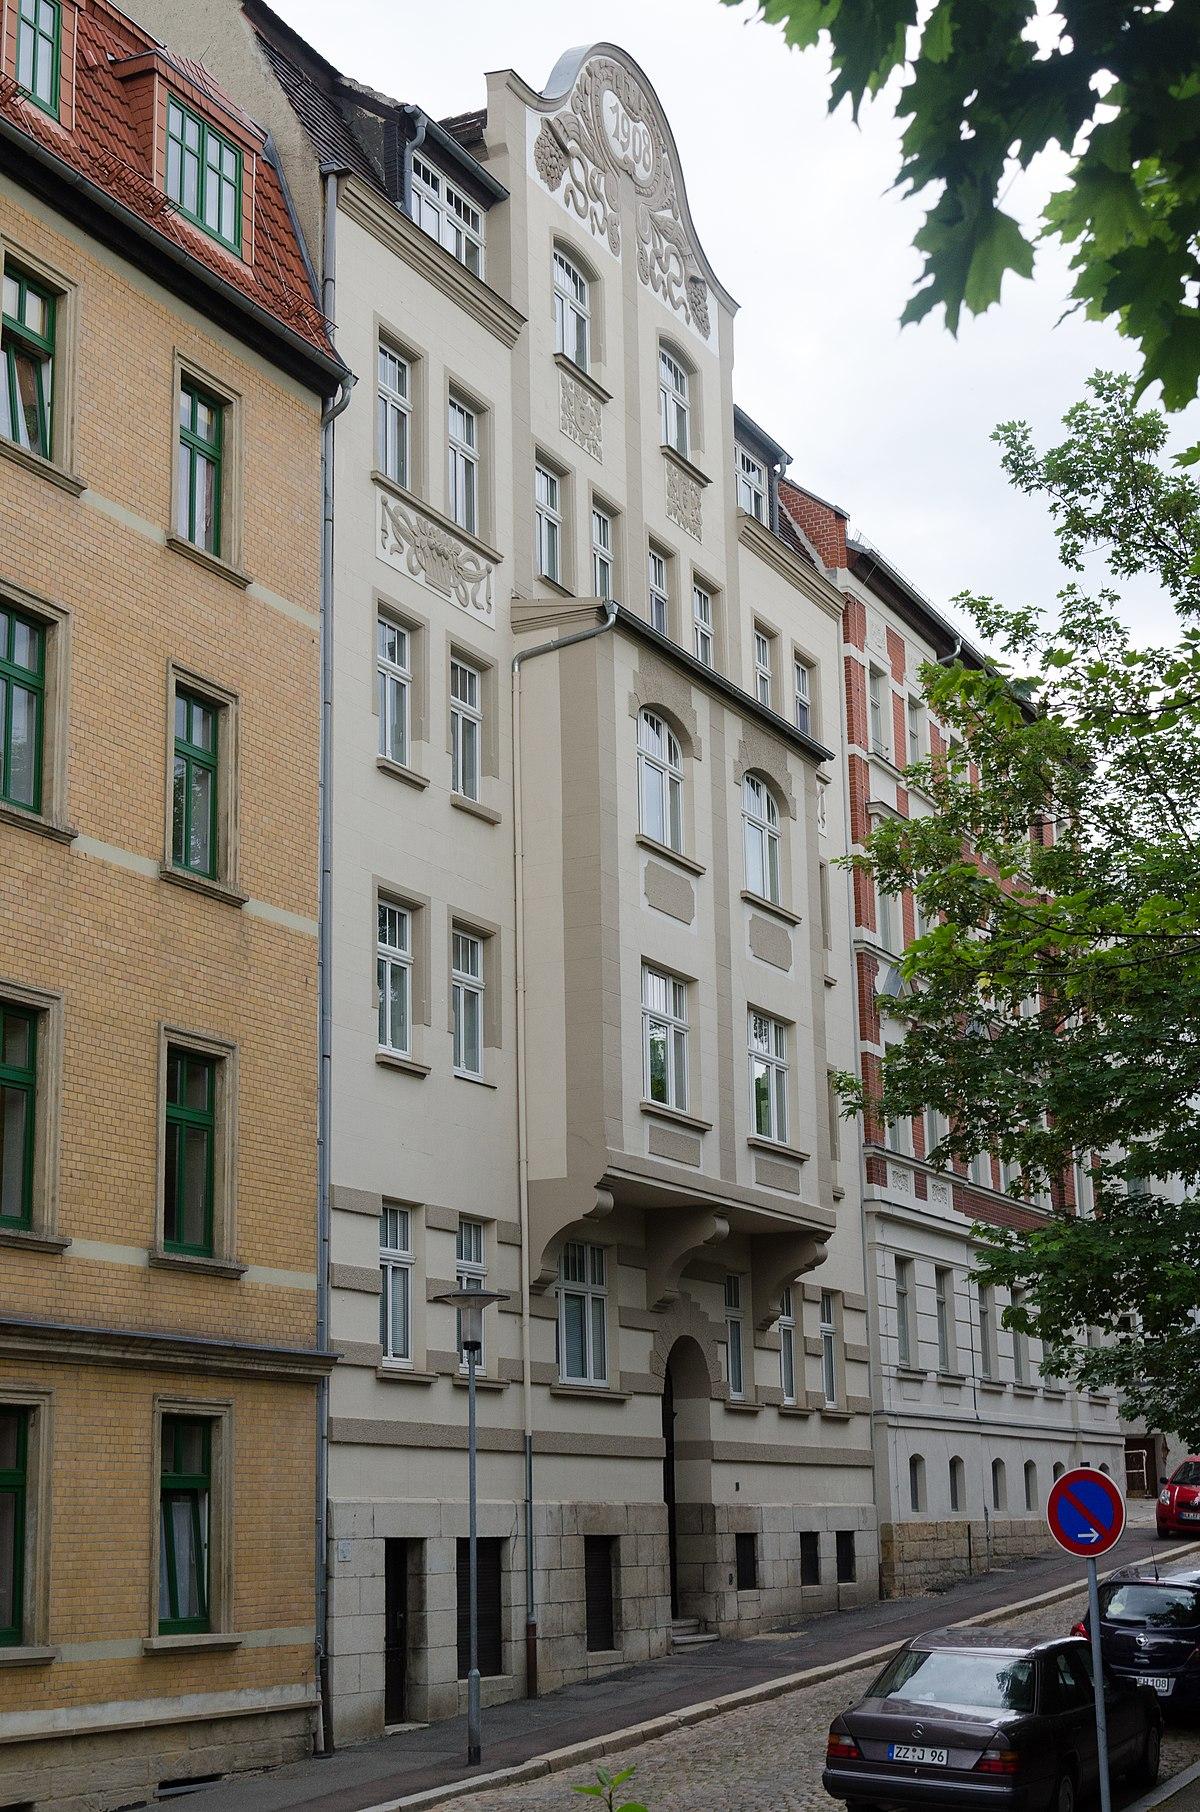 Thomas Mann Straße